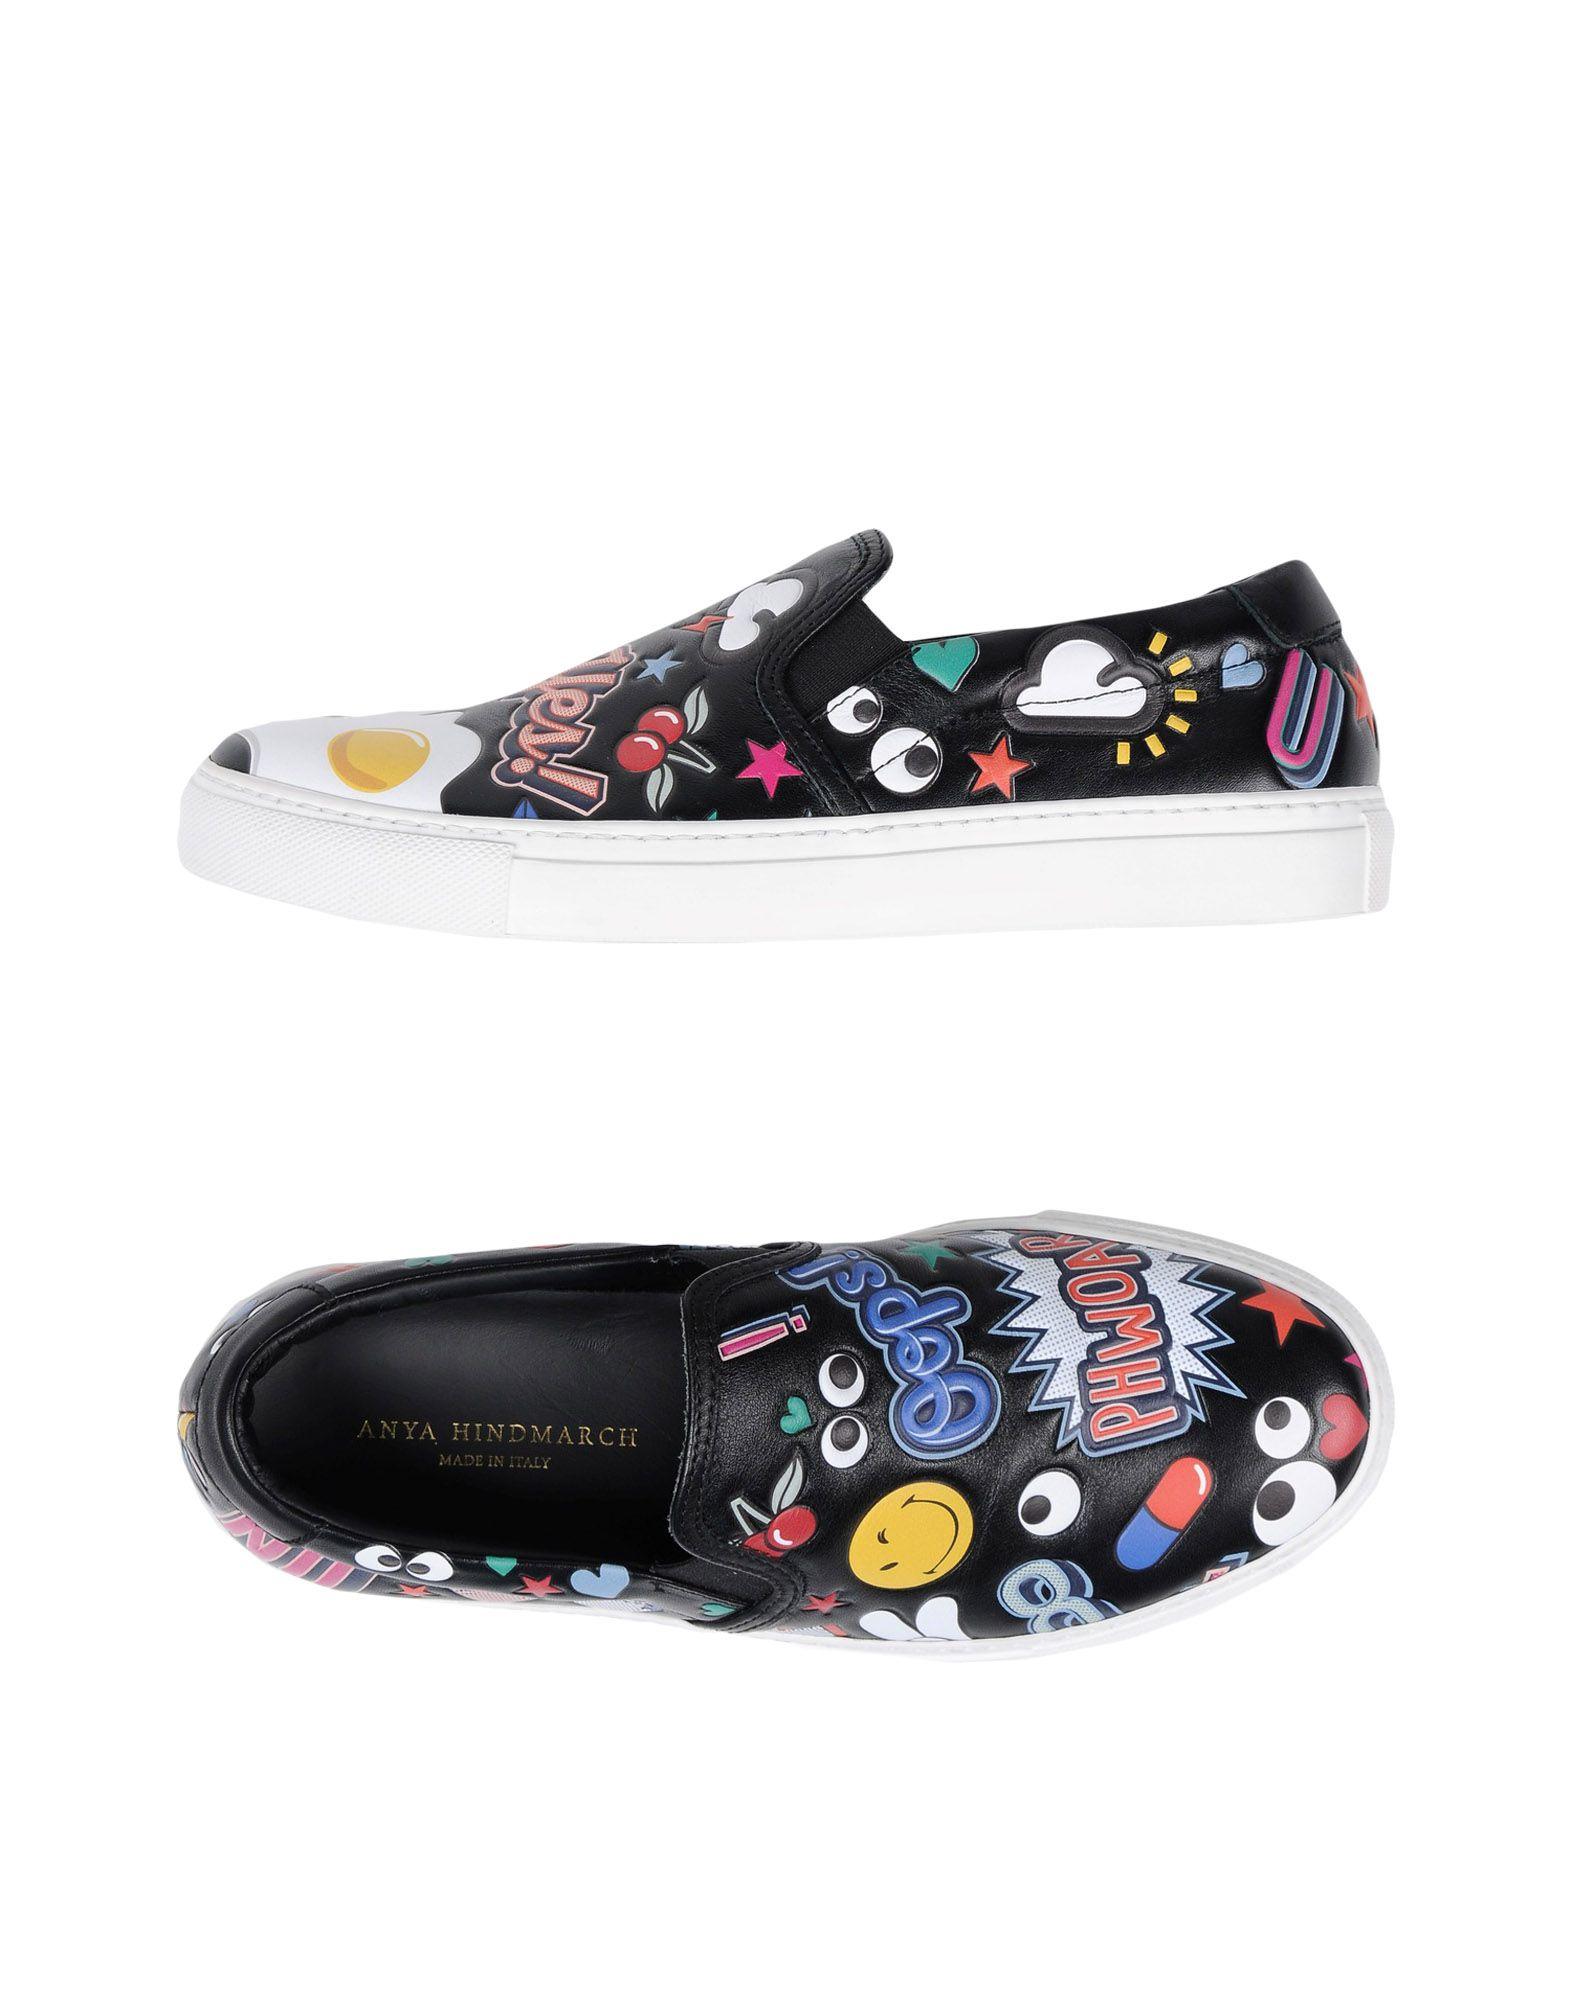 Rabatt Schuhe Anya Damen Hindmarch Sneakers Damen Anya  11518043EN 9de75a